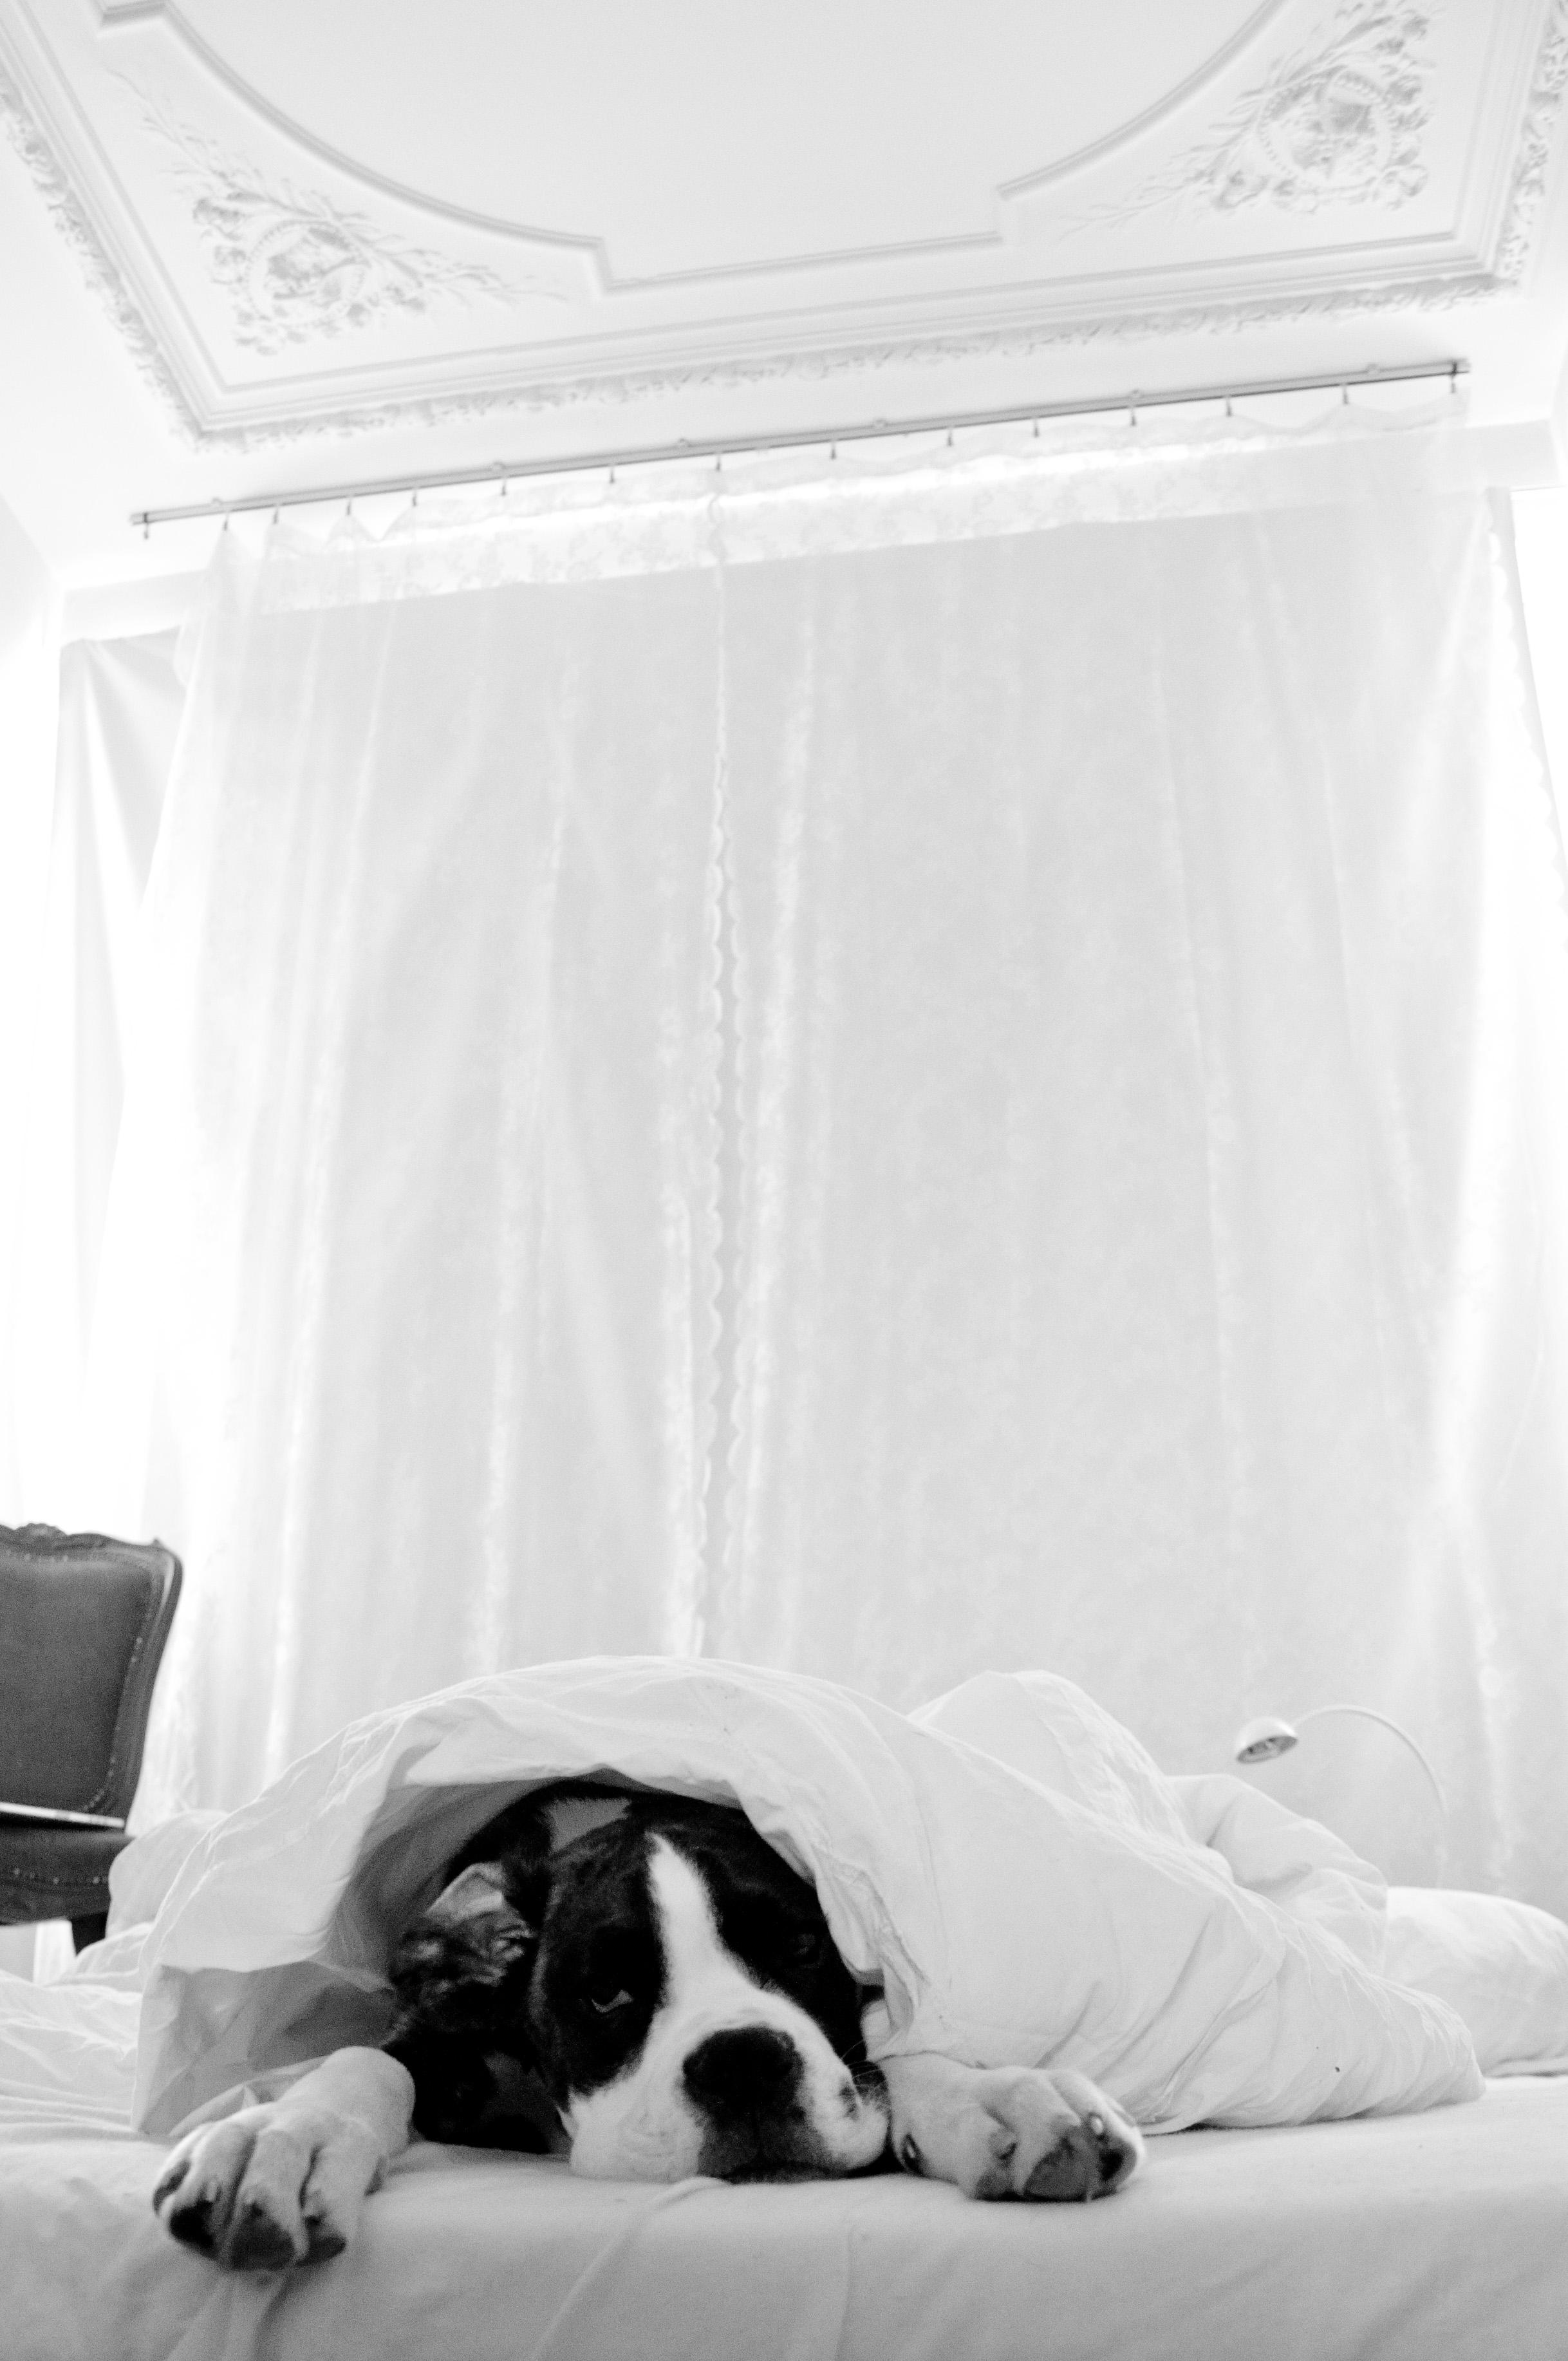 Dog sleeping in bed photo